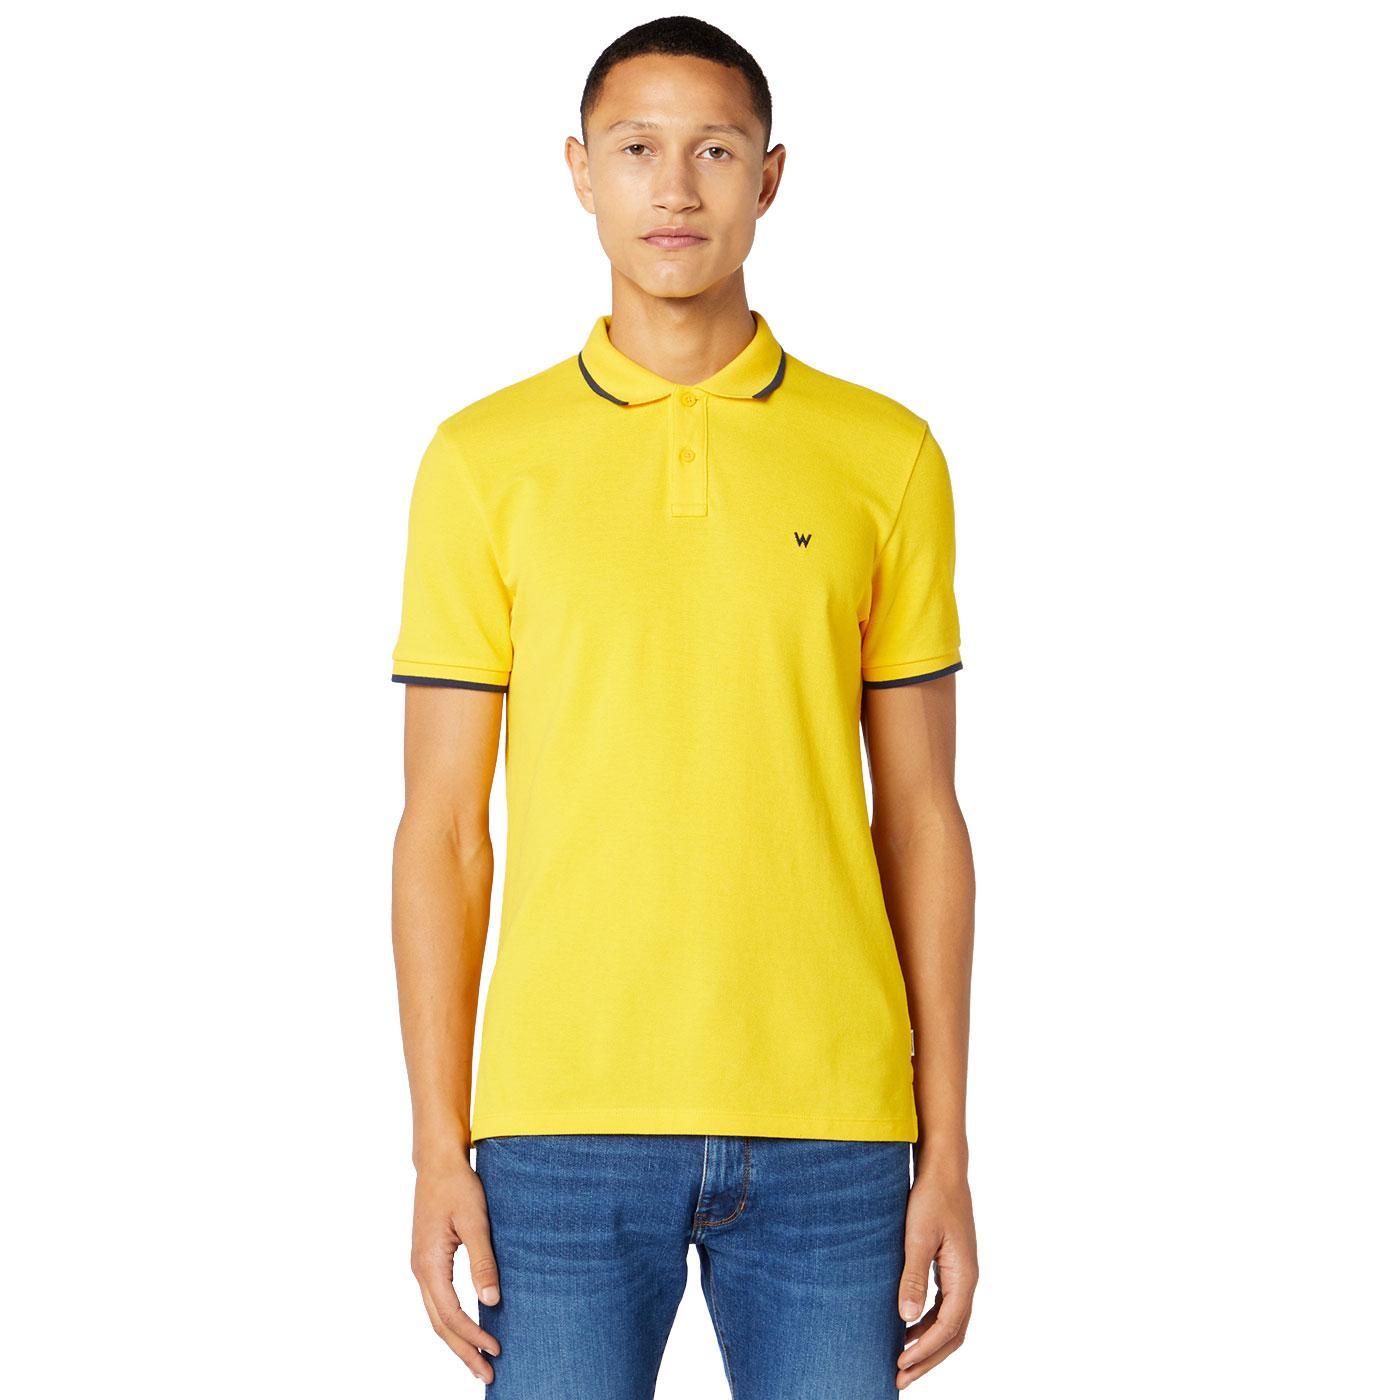 WRANGLER Men's Retro Tipped Pique Polo Shirt LEMON